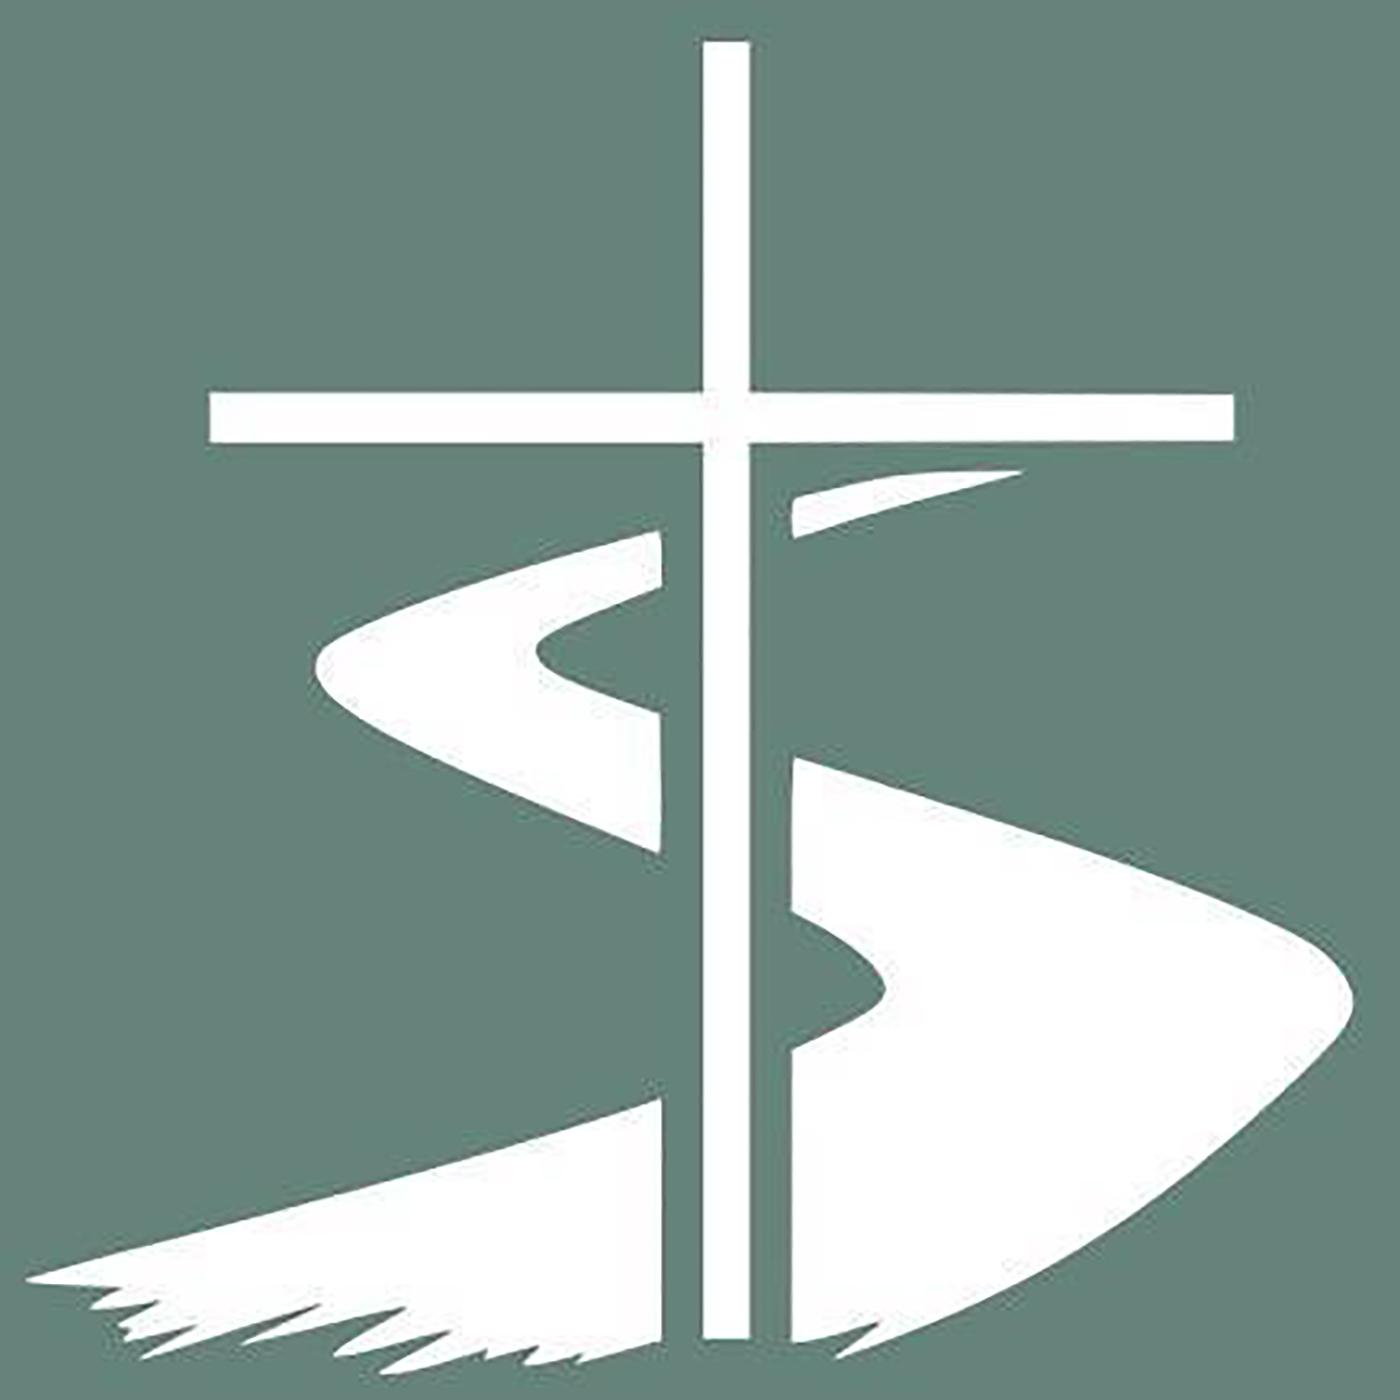 Marveling at God, Luke 24:1-12 & Acts 10:34-43